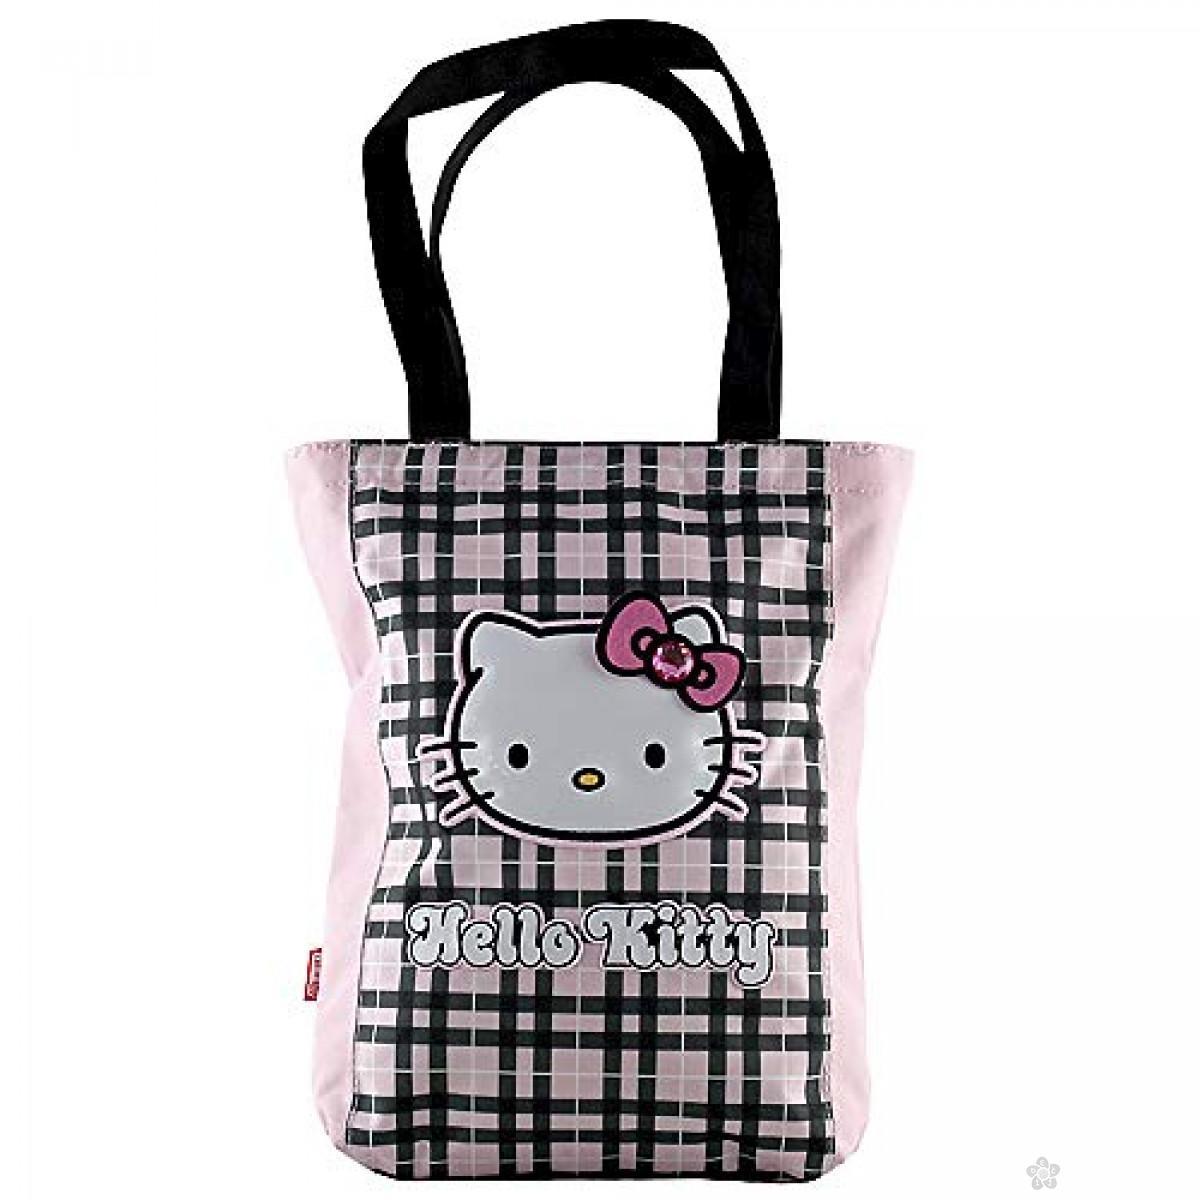 Torba za kupovinu Hello Kitty 11949